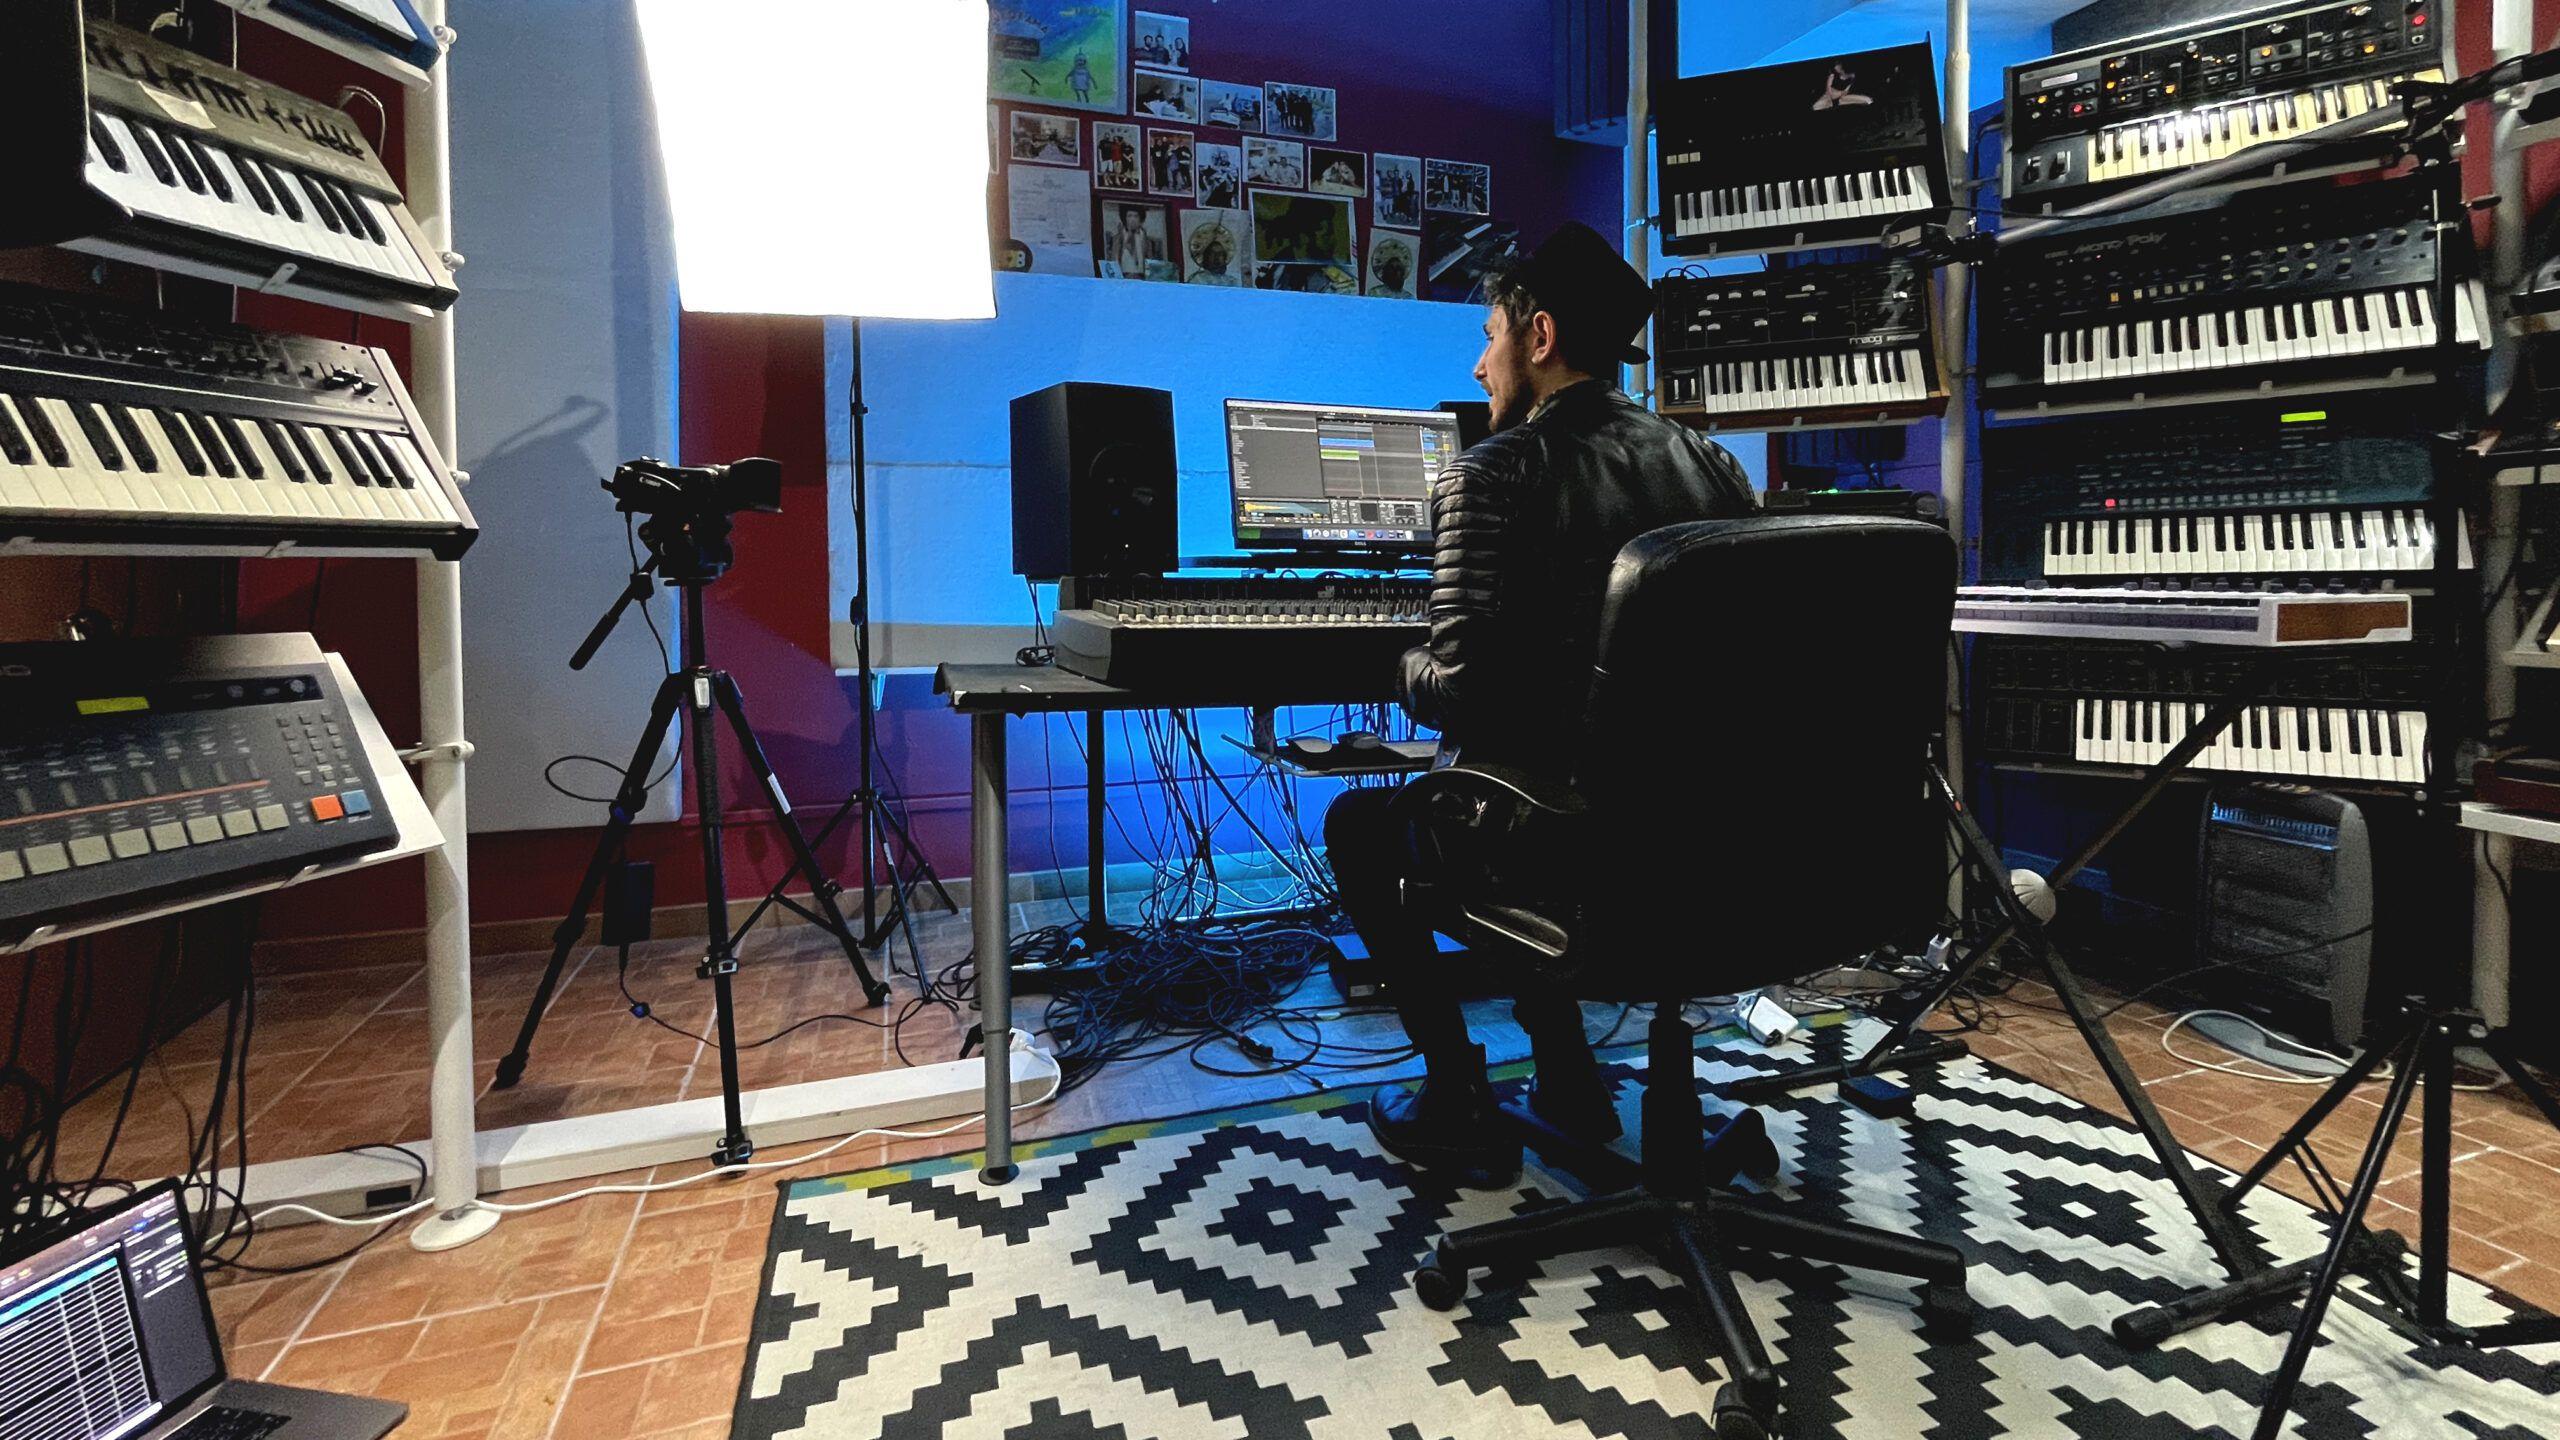 Meet SEEDJ: a digital acceleration platform, academy for DJs to grow professionally